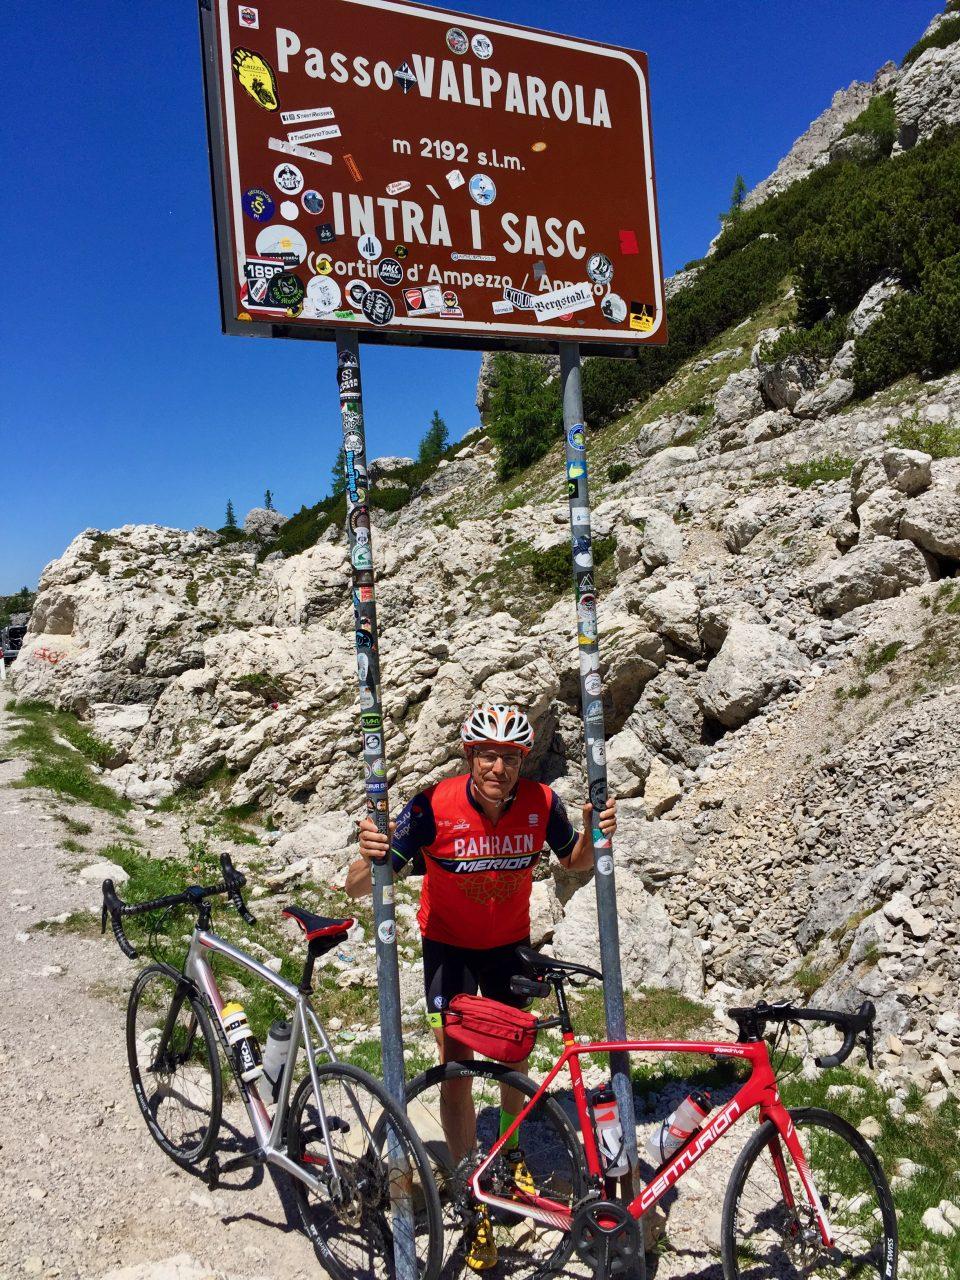 Martin, Passo Valparola, Dolomites, Italy